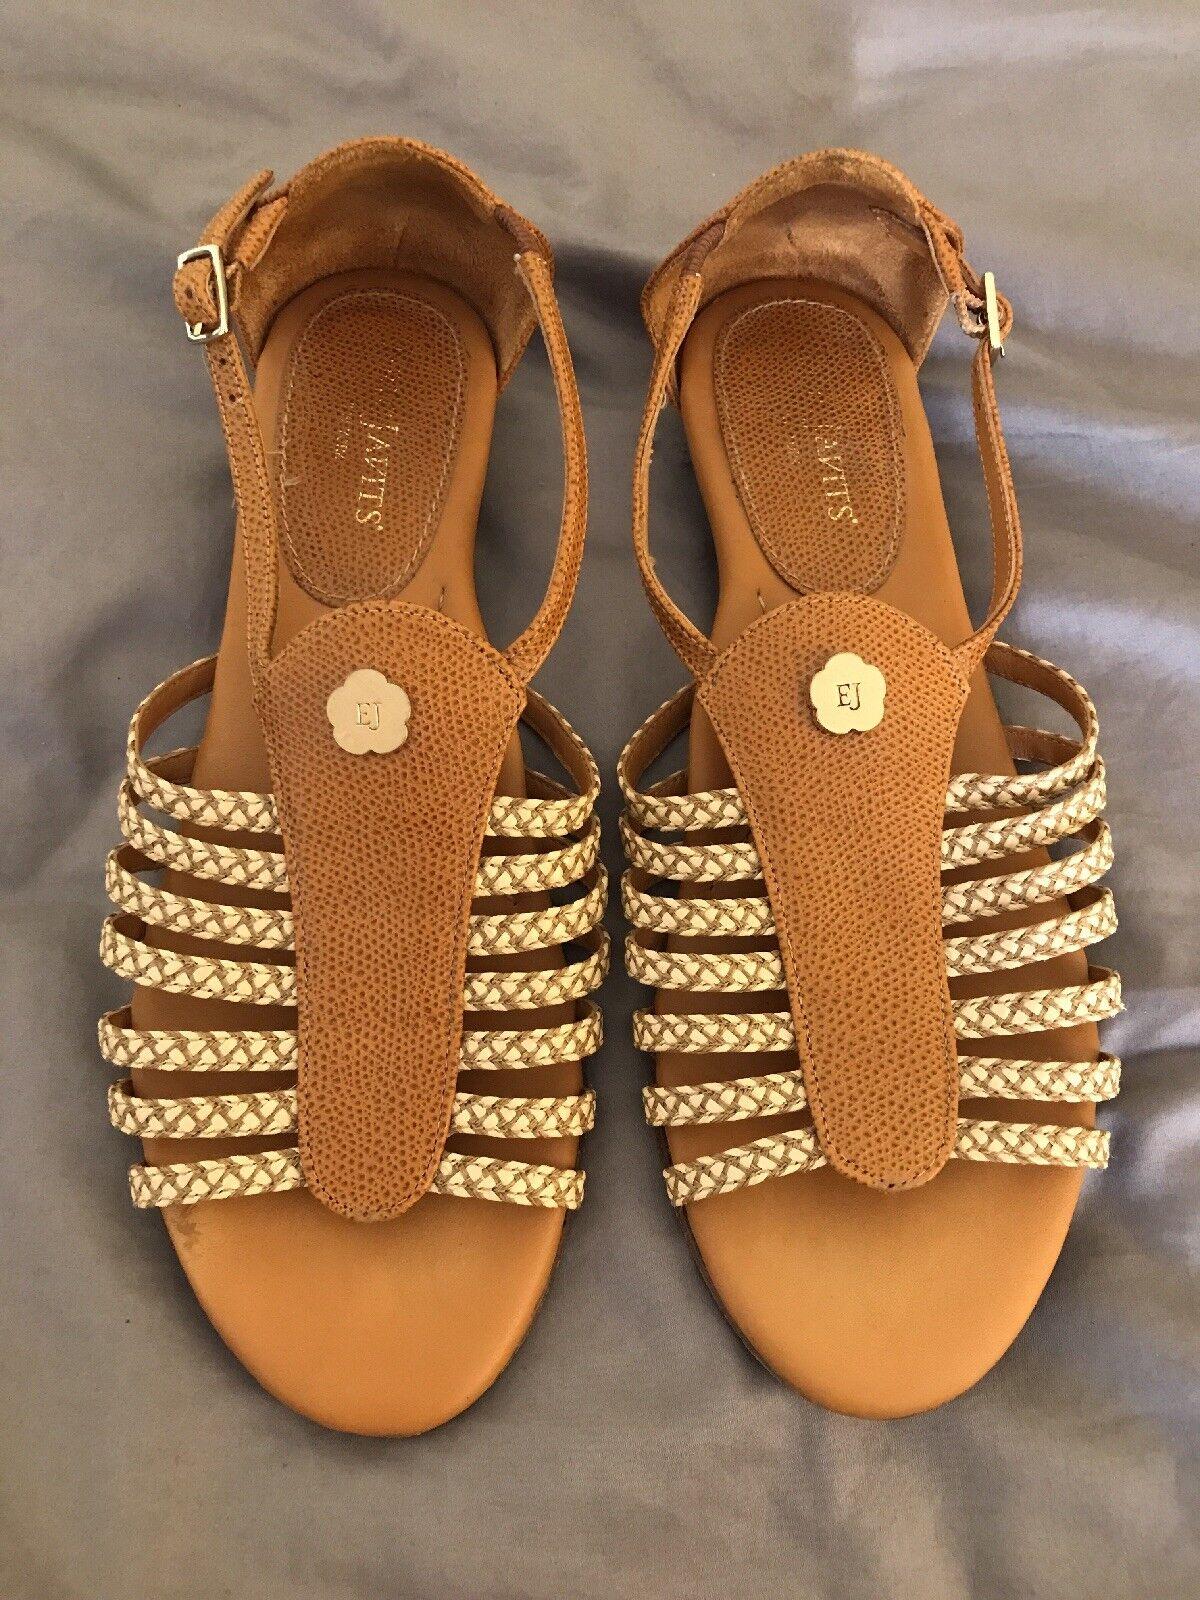 Eric flat Javits 250 Greco peanut flat Eric gladiator Sandale shoe. Damens's Größe 7.5 341e99